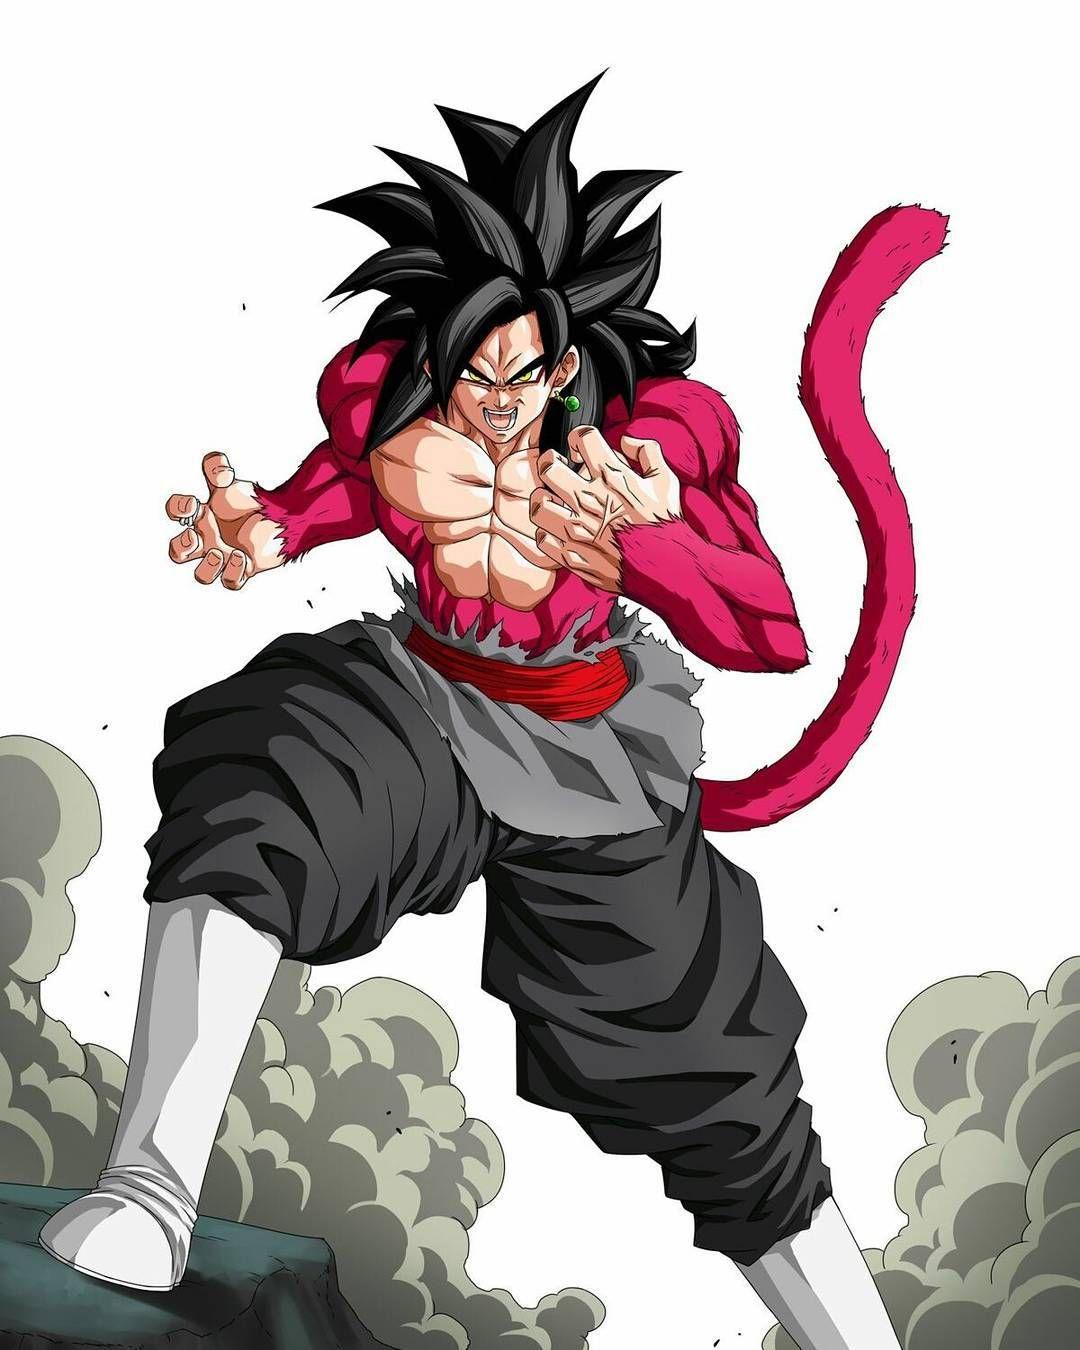 Goku Black Ssj4 Follow Officialdragonballsuper Double Tap To Like Comment Below Tag Yo Dragon Ball Super Manga Anime Dragon Ball Super Dragon Ball Goku